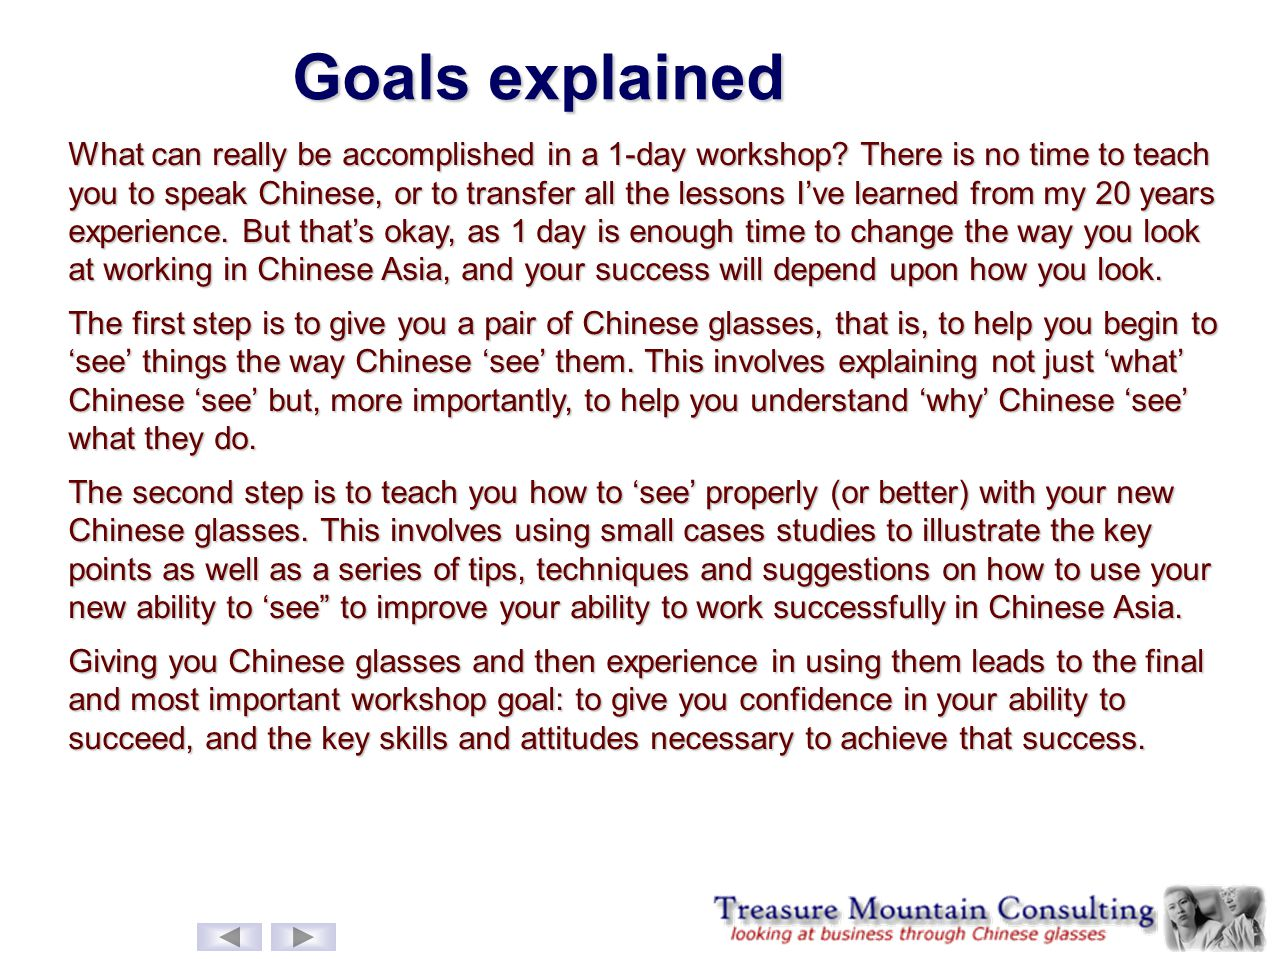 Goals explained